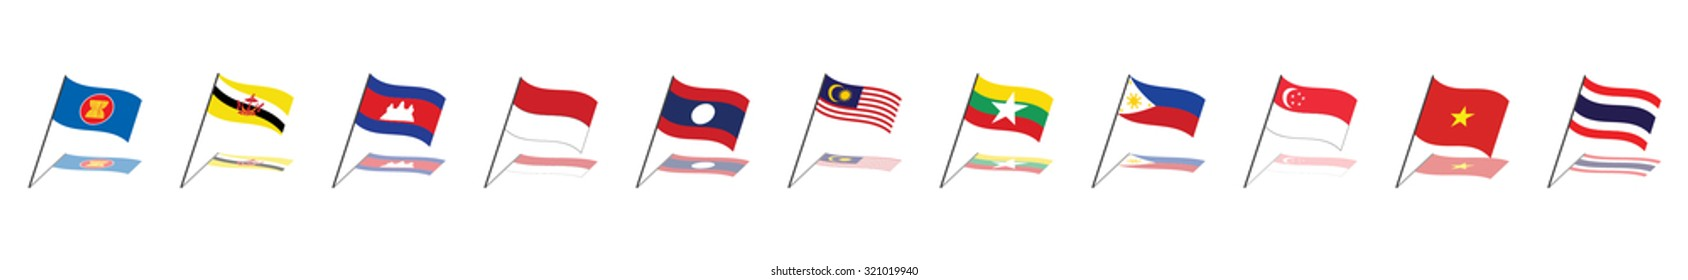 ASEAN Economic Community, AEC business flag forum, for design present template header background in vector